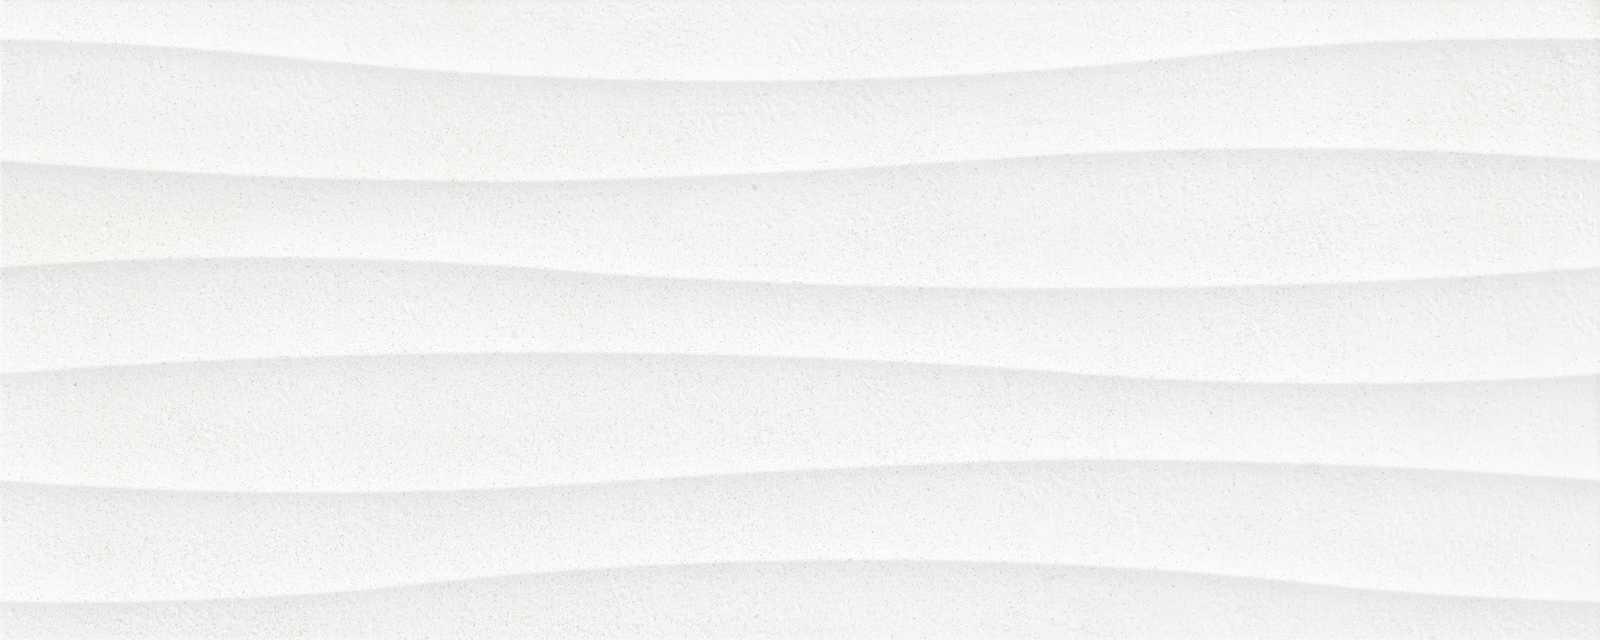 APPEAL STRUTTURA WIND 200X500 WHITE - (Euro/Mq 20,13)